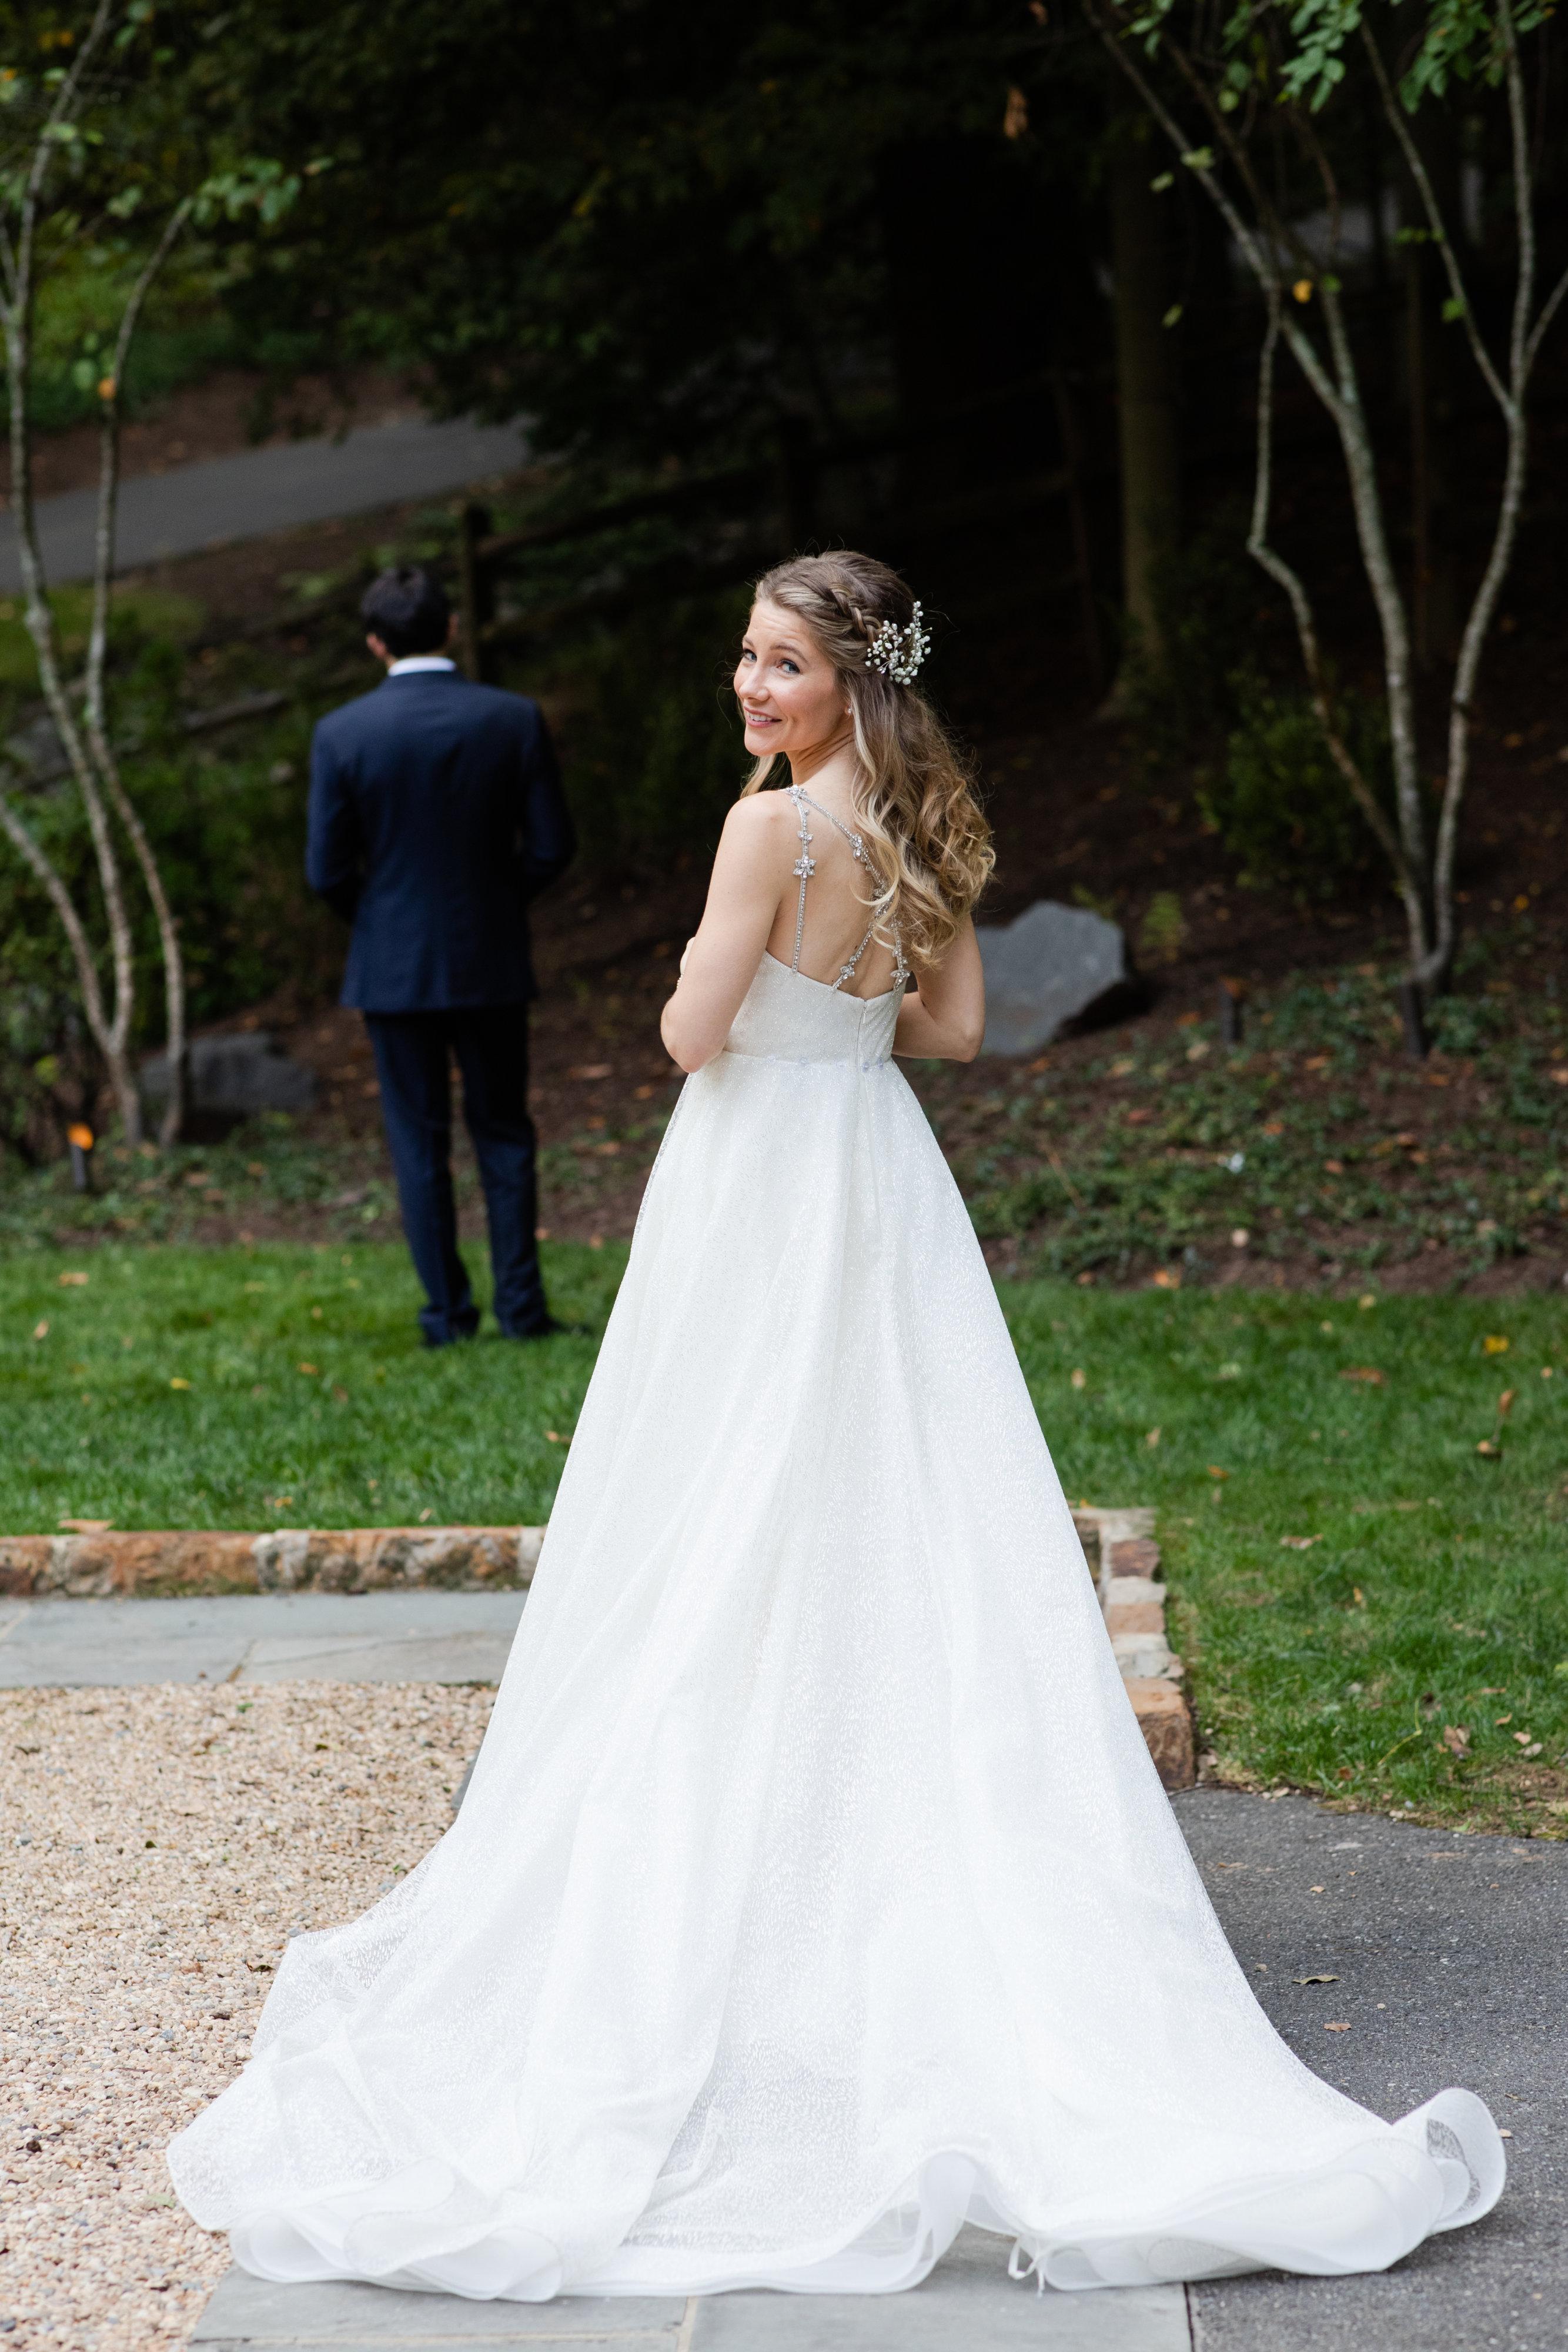 StefanieKamermanPhotography-MelanieandBenjamin-Wedding-Bethesda,MD-2019-10-12-103